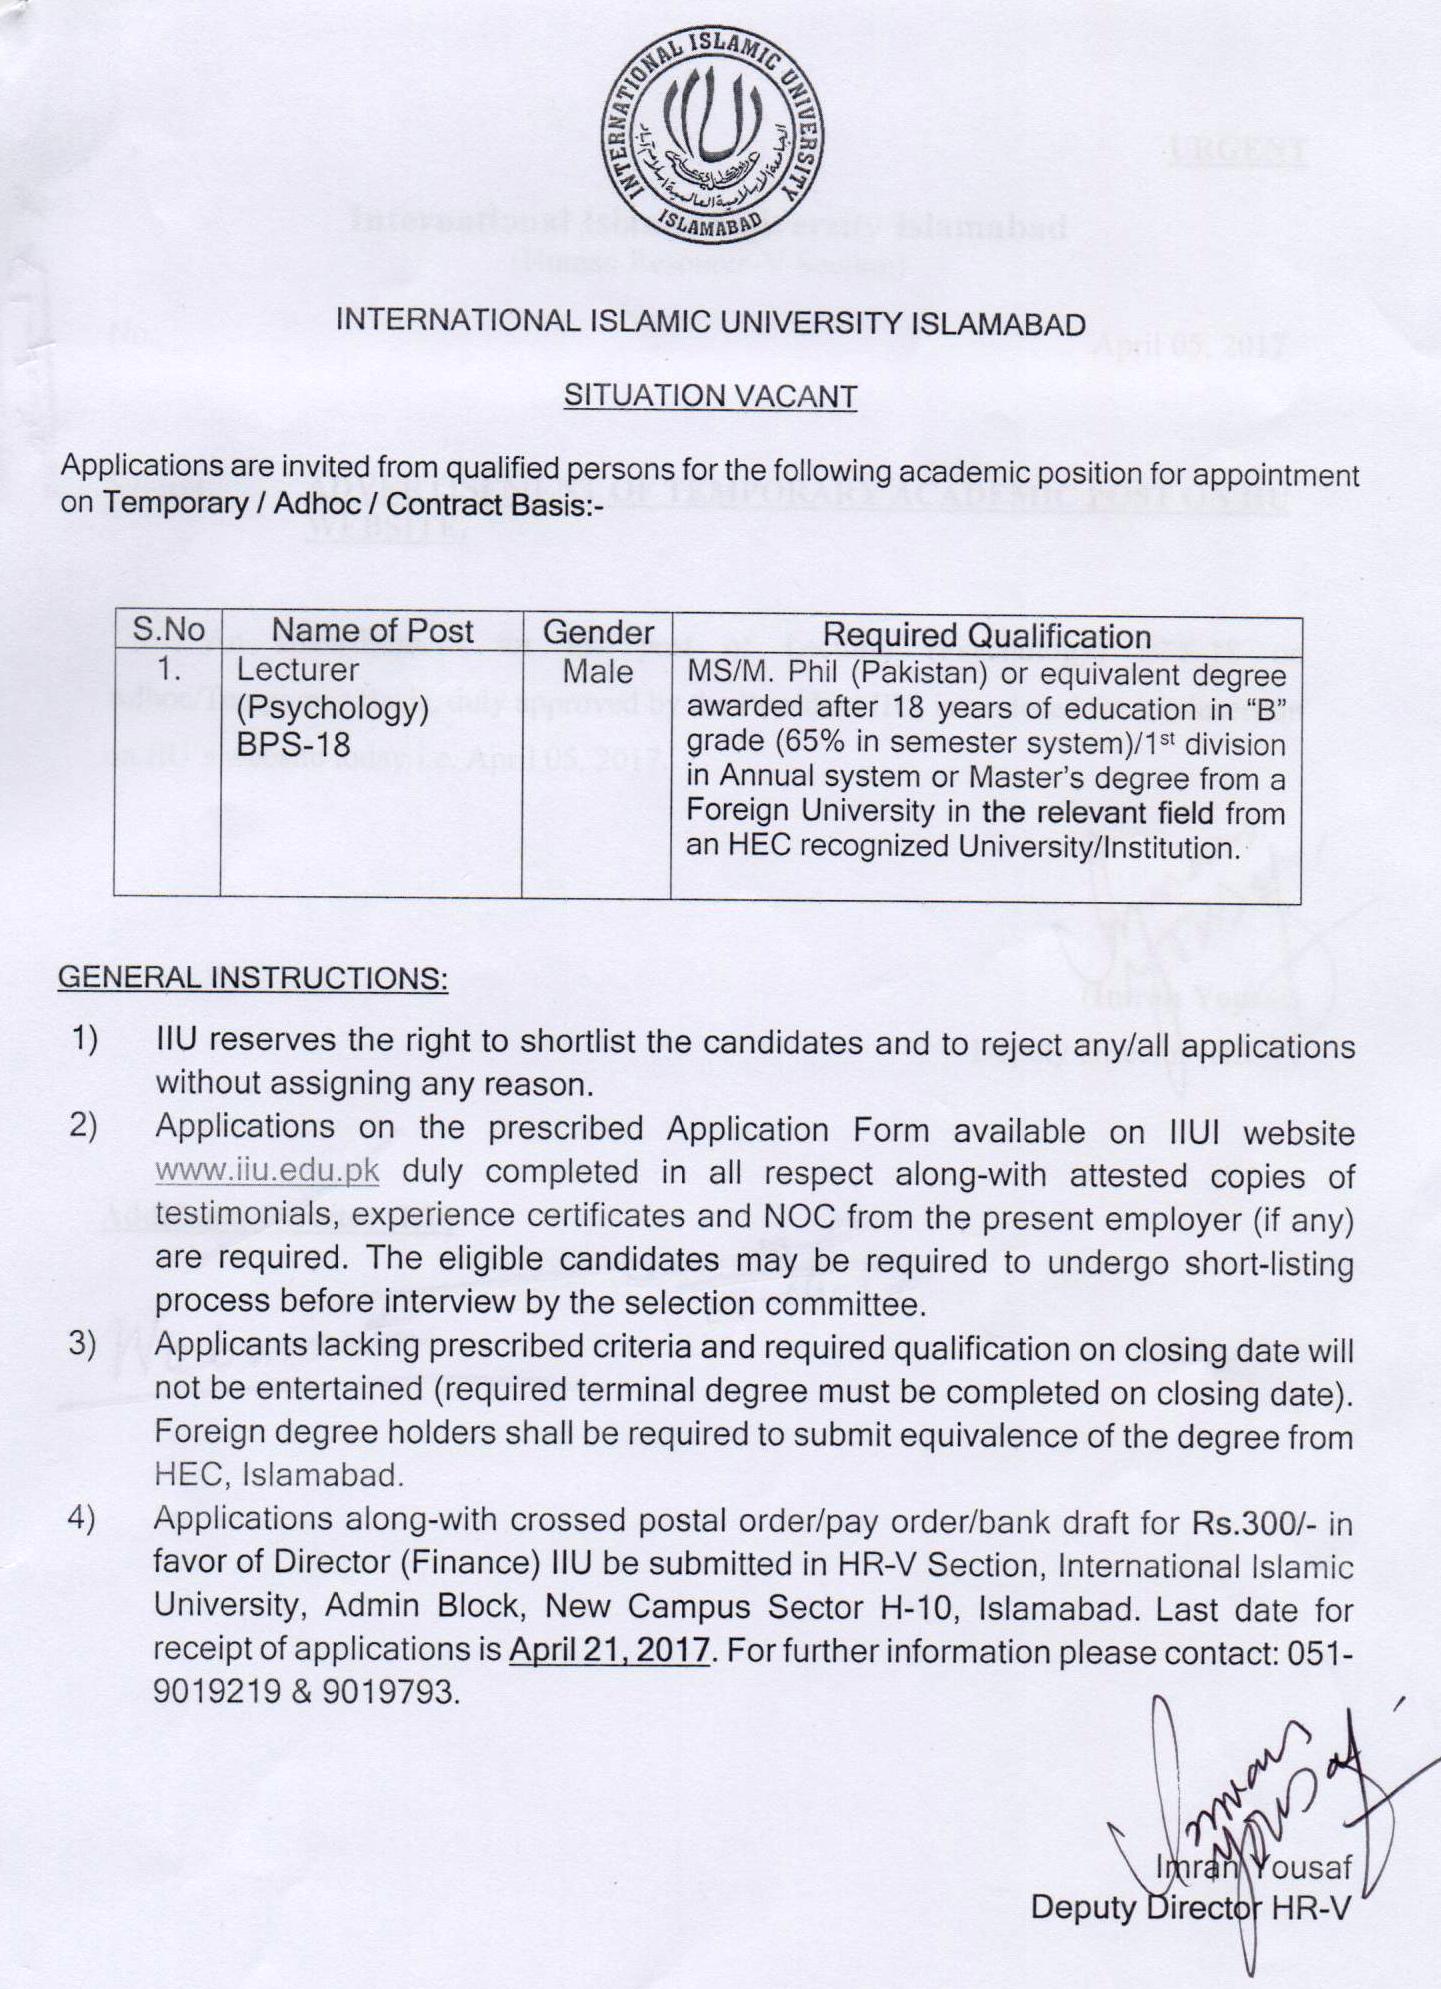 university jobs international islamic university situation vacant